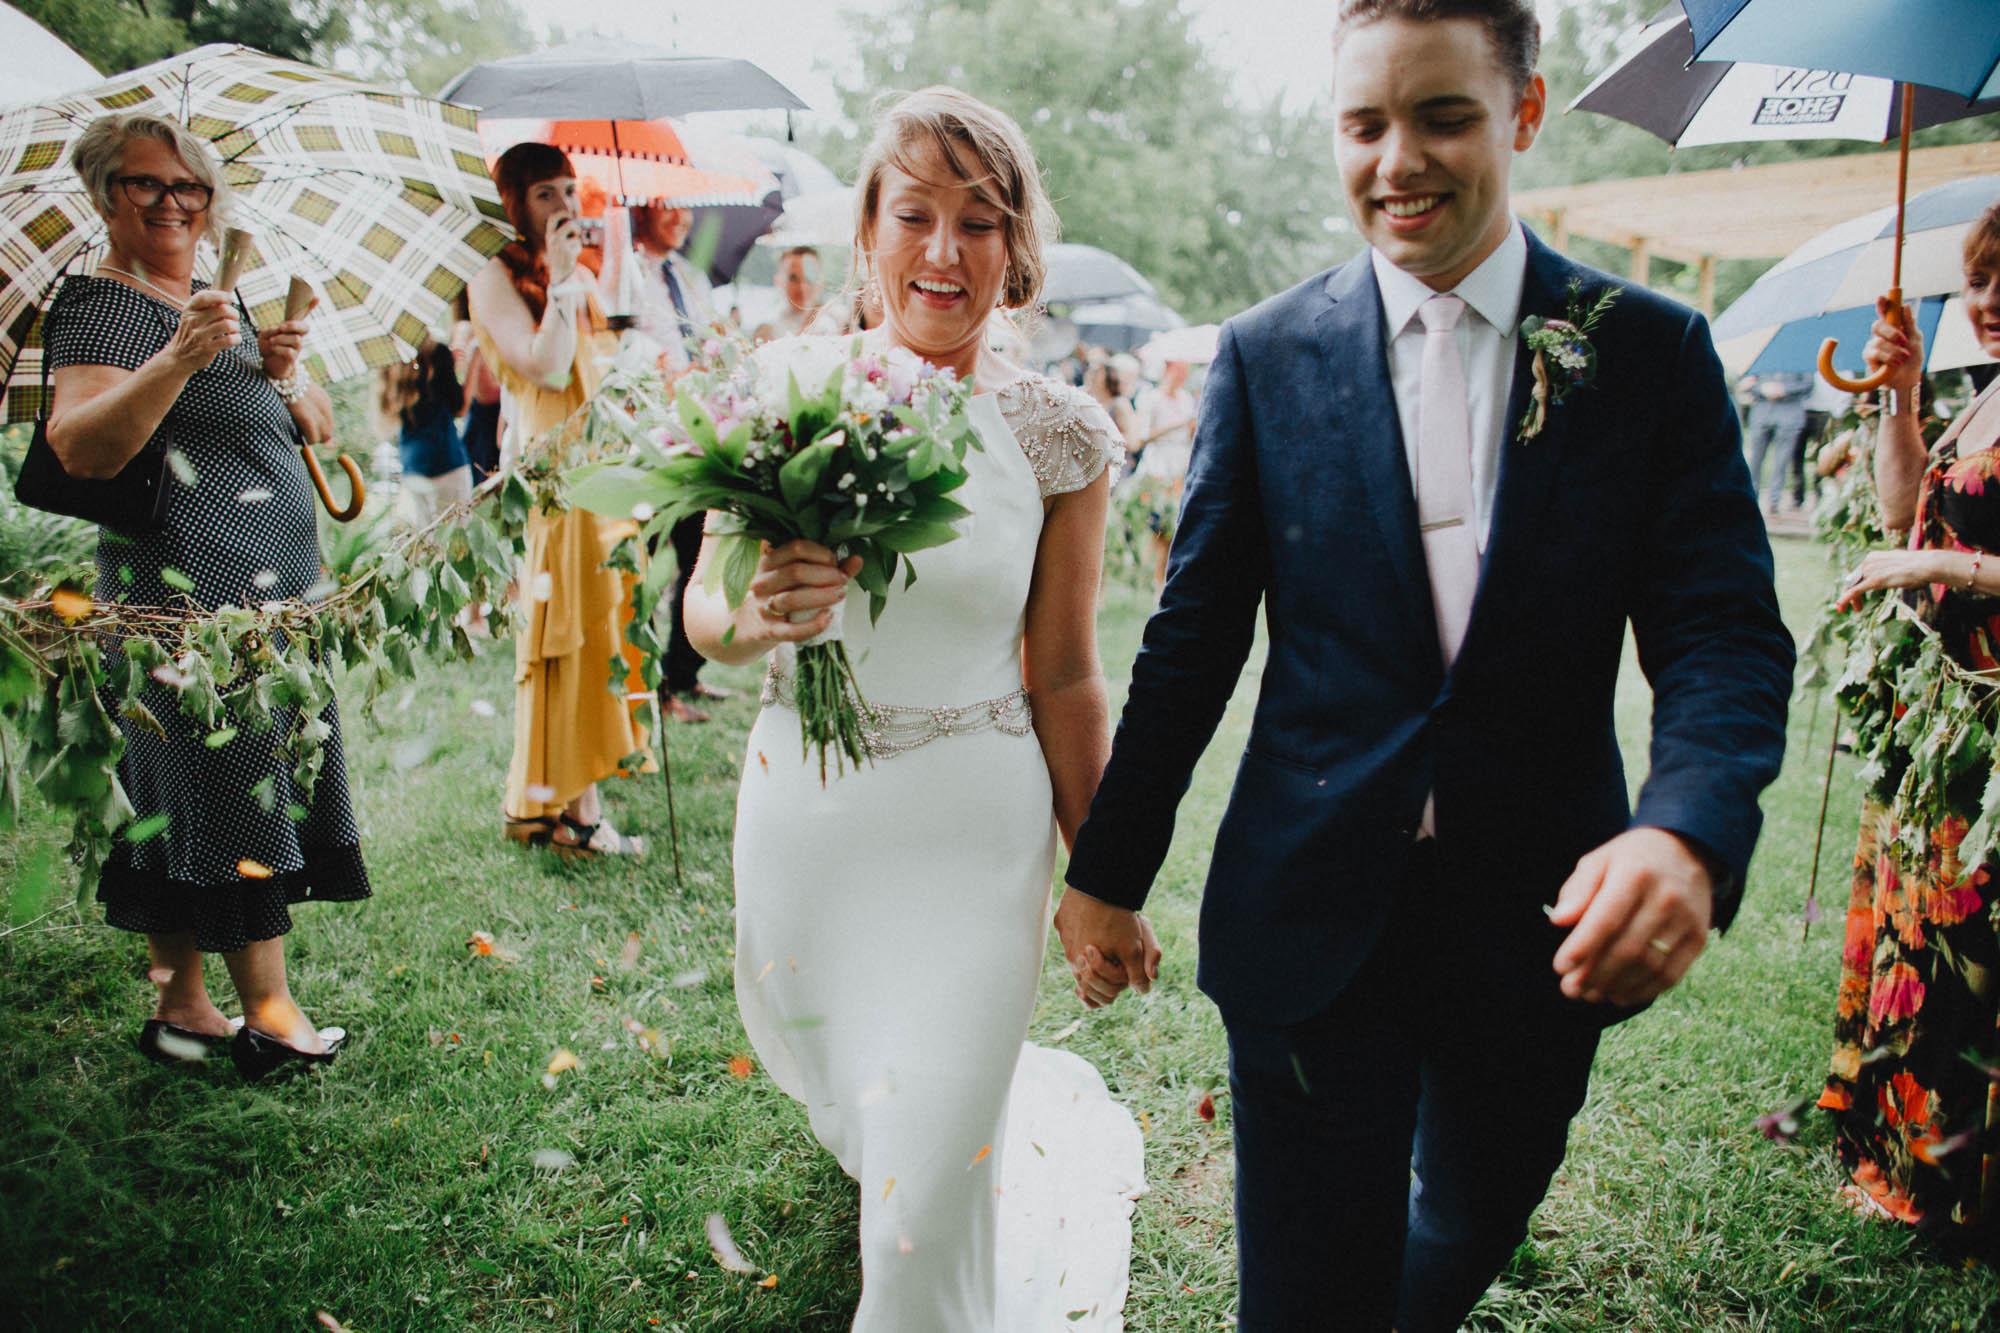 Leah-Graham-Michigan-Outdoor-DIY-Wedding-056@2x.jpg